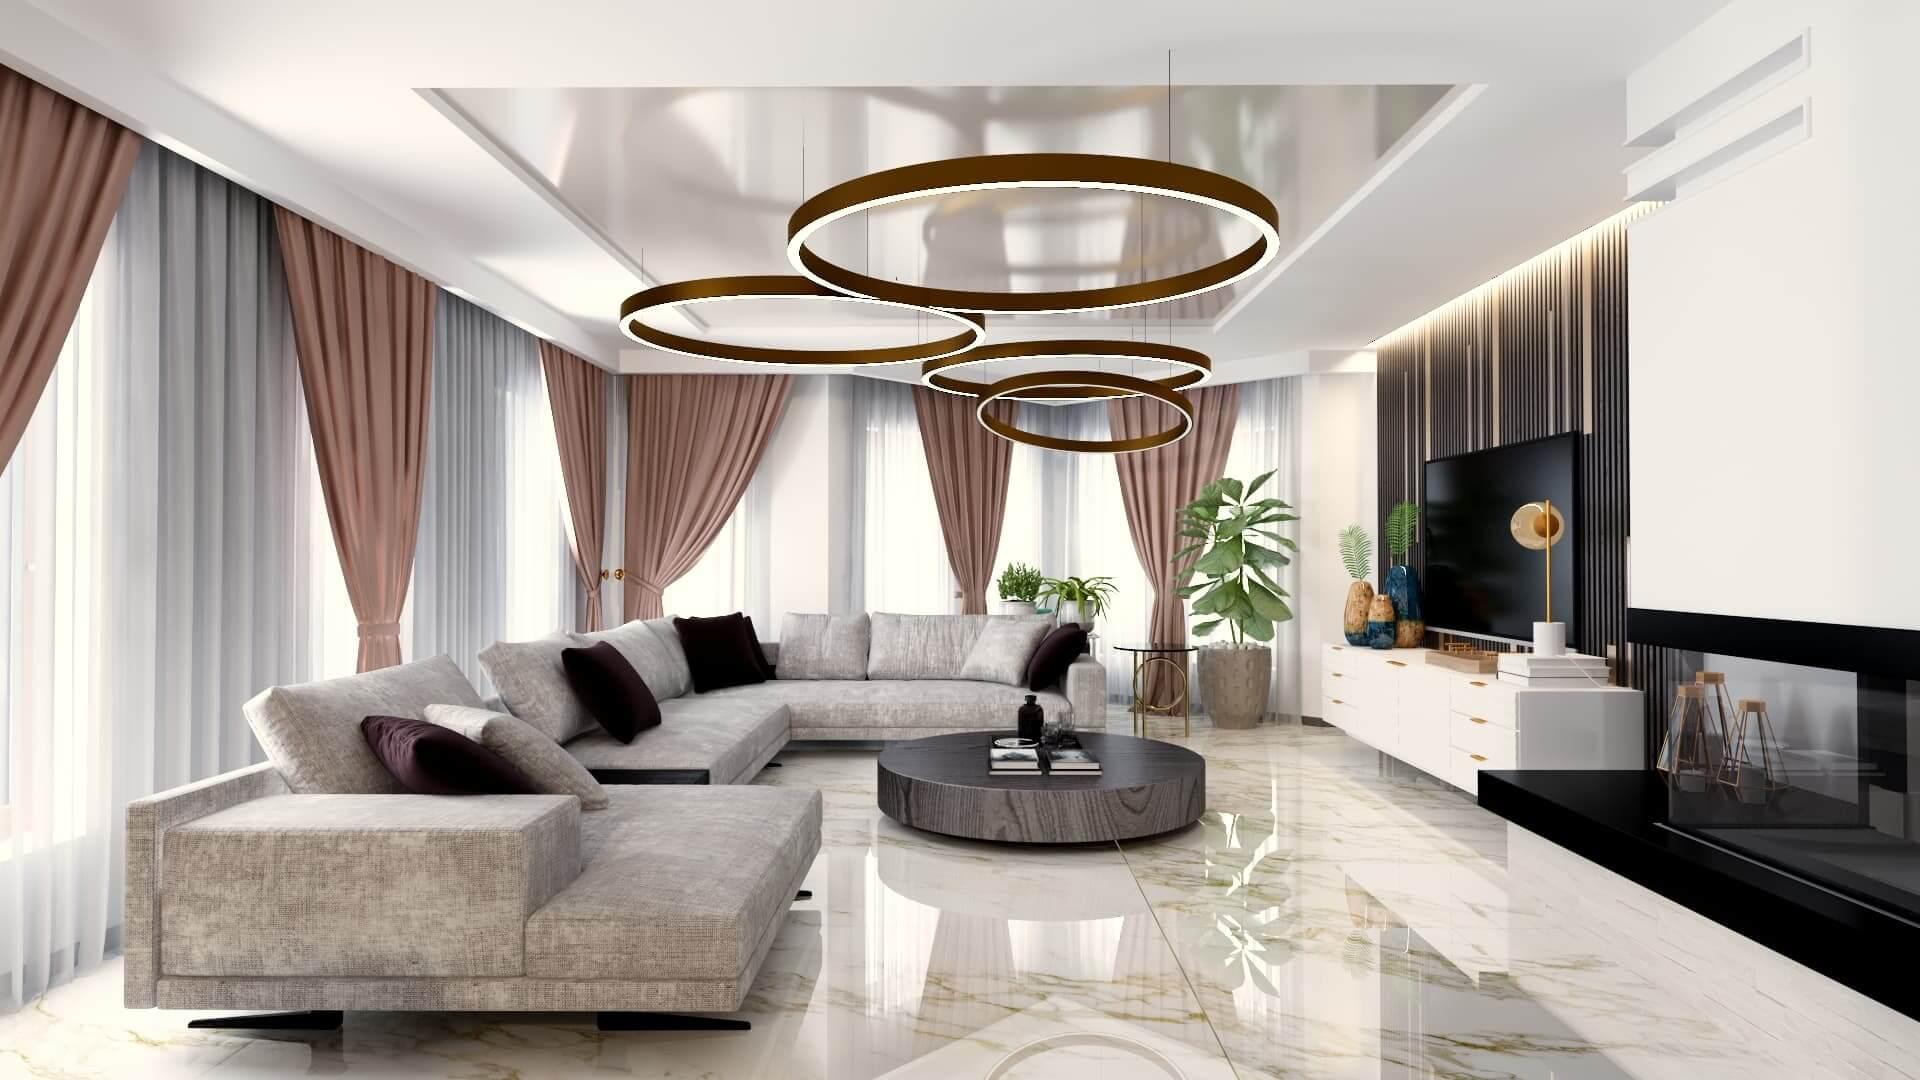 Casa si design interior